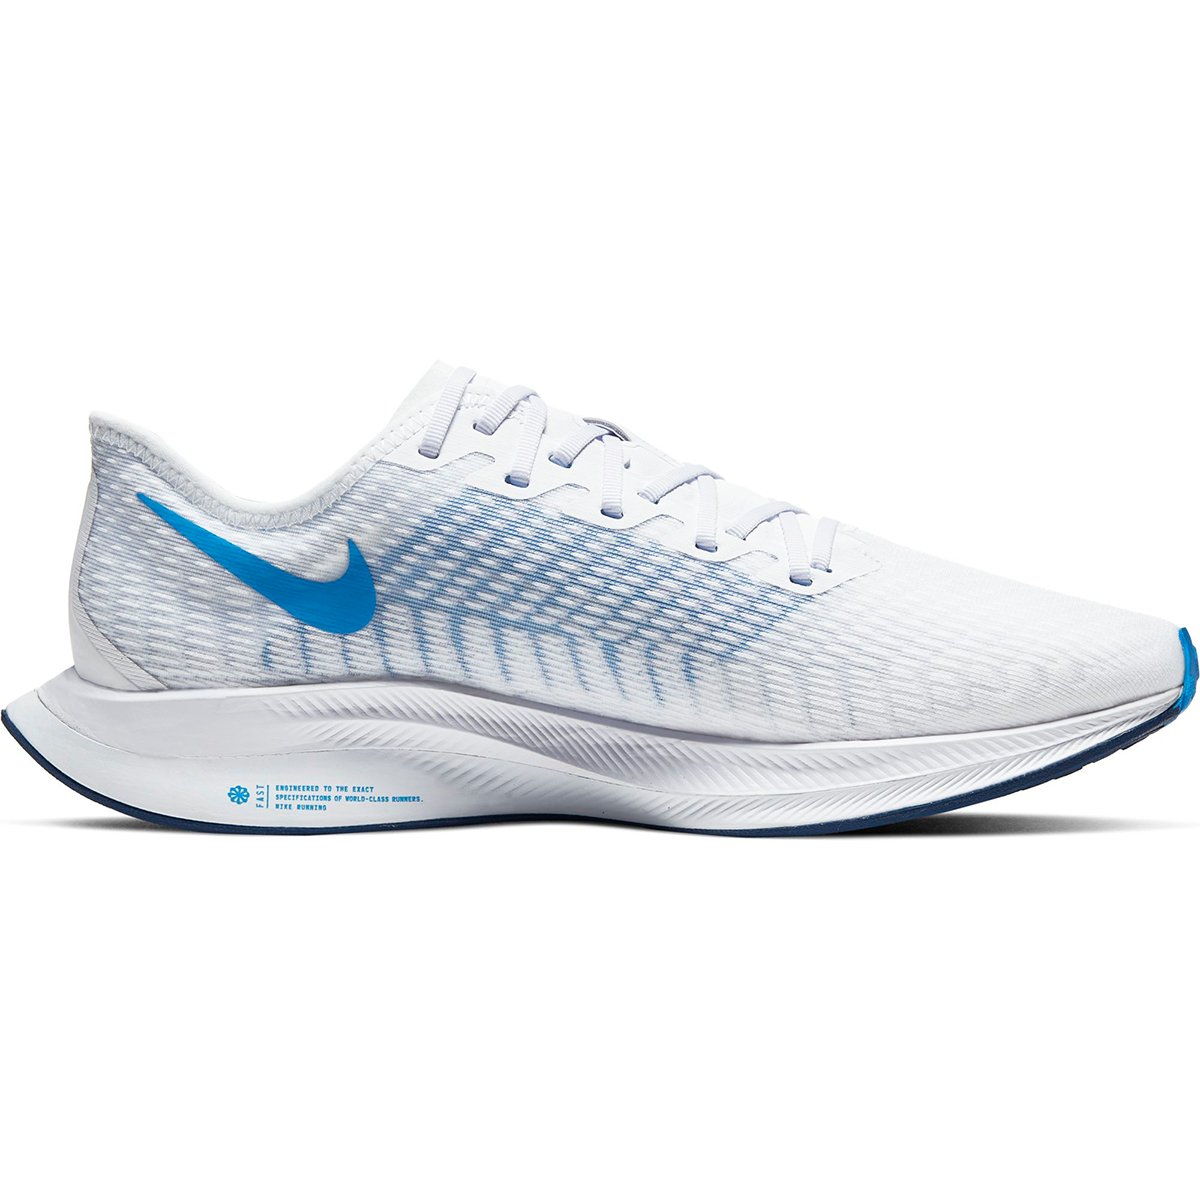 Men's Nike Zoom Pegasus Turbo 2 Running Shoe - Color: White/Blue Void/Football Grey/Photo Blue (Regular Width) - Size: 6, White/Blue Void/Football Grey/Photo Blue, large, image 1